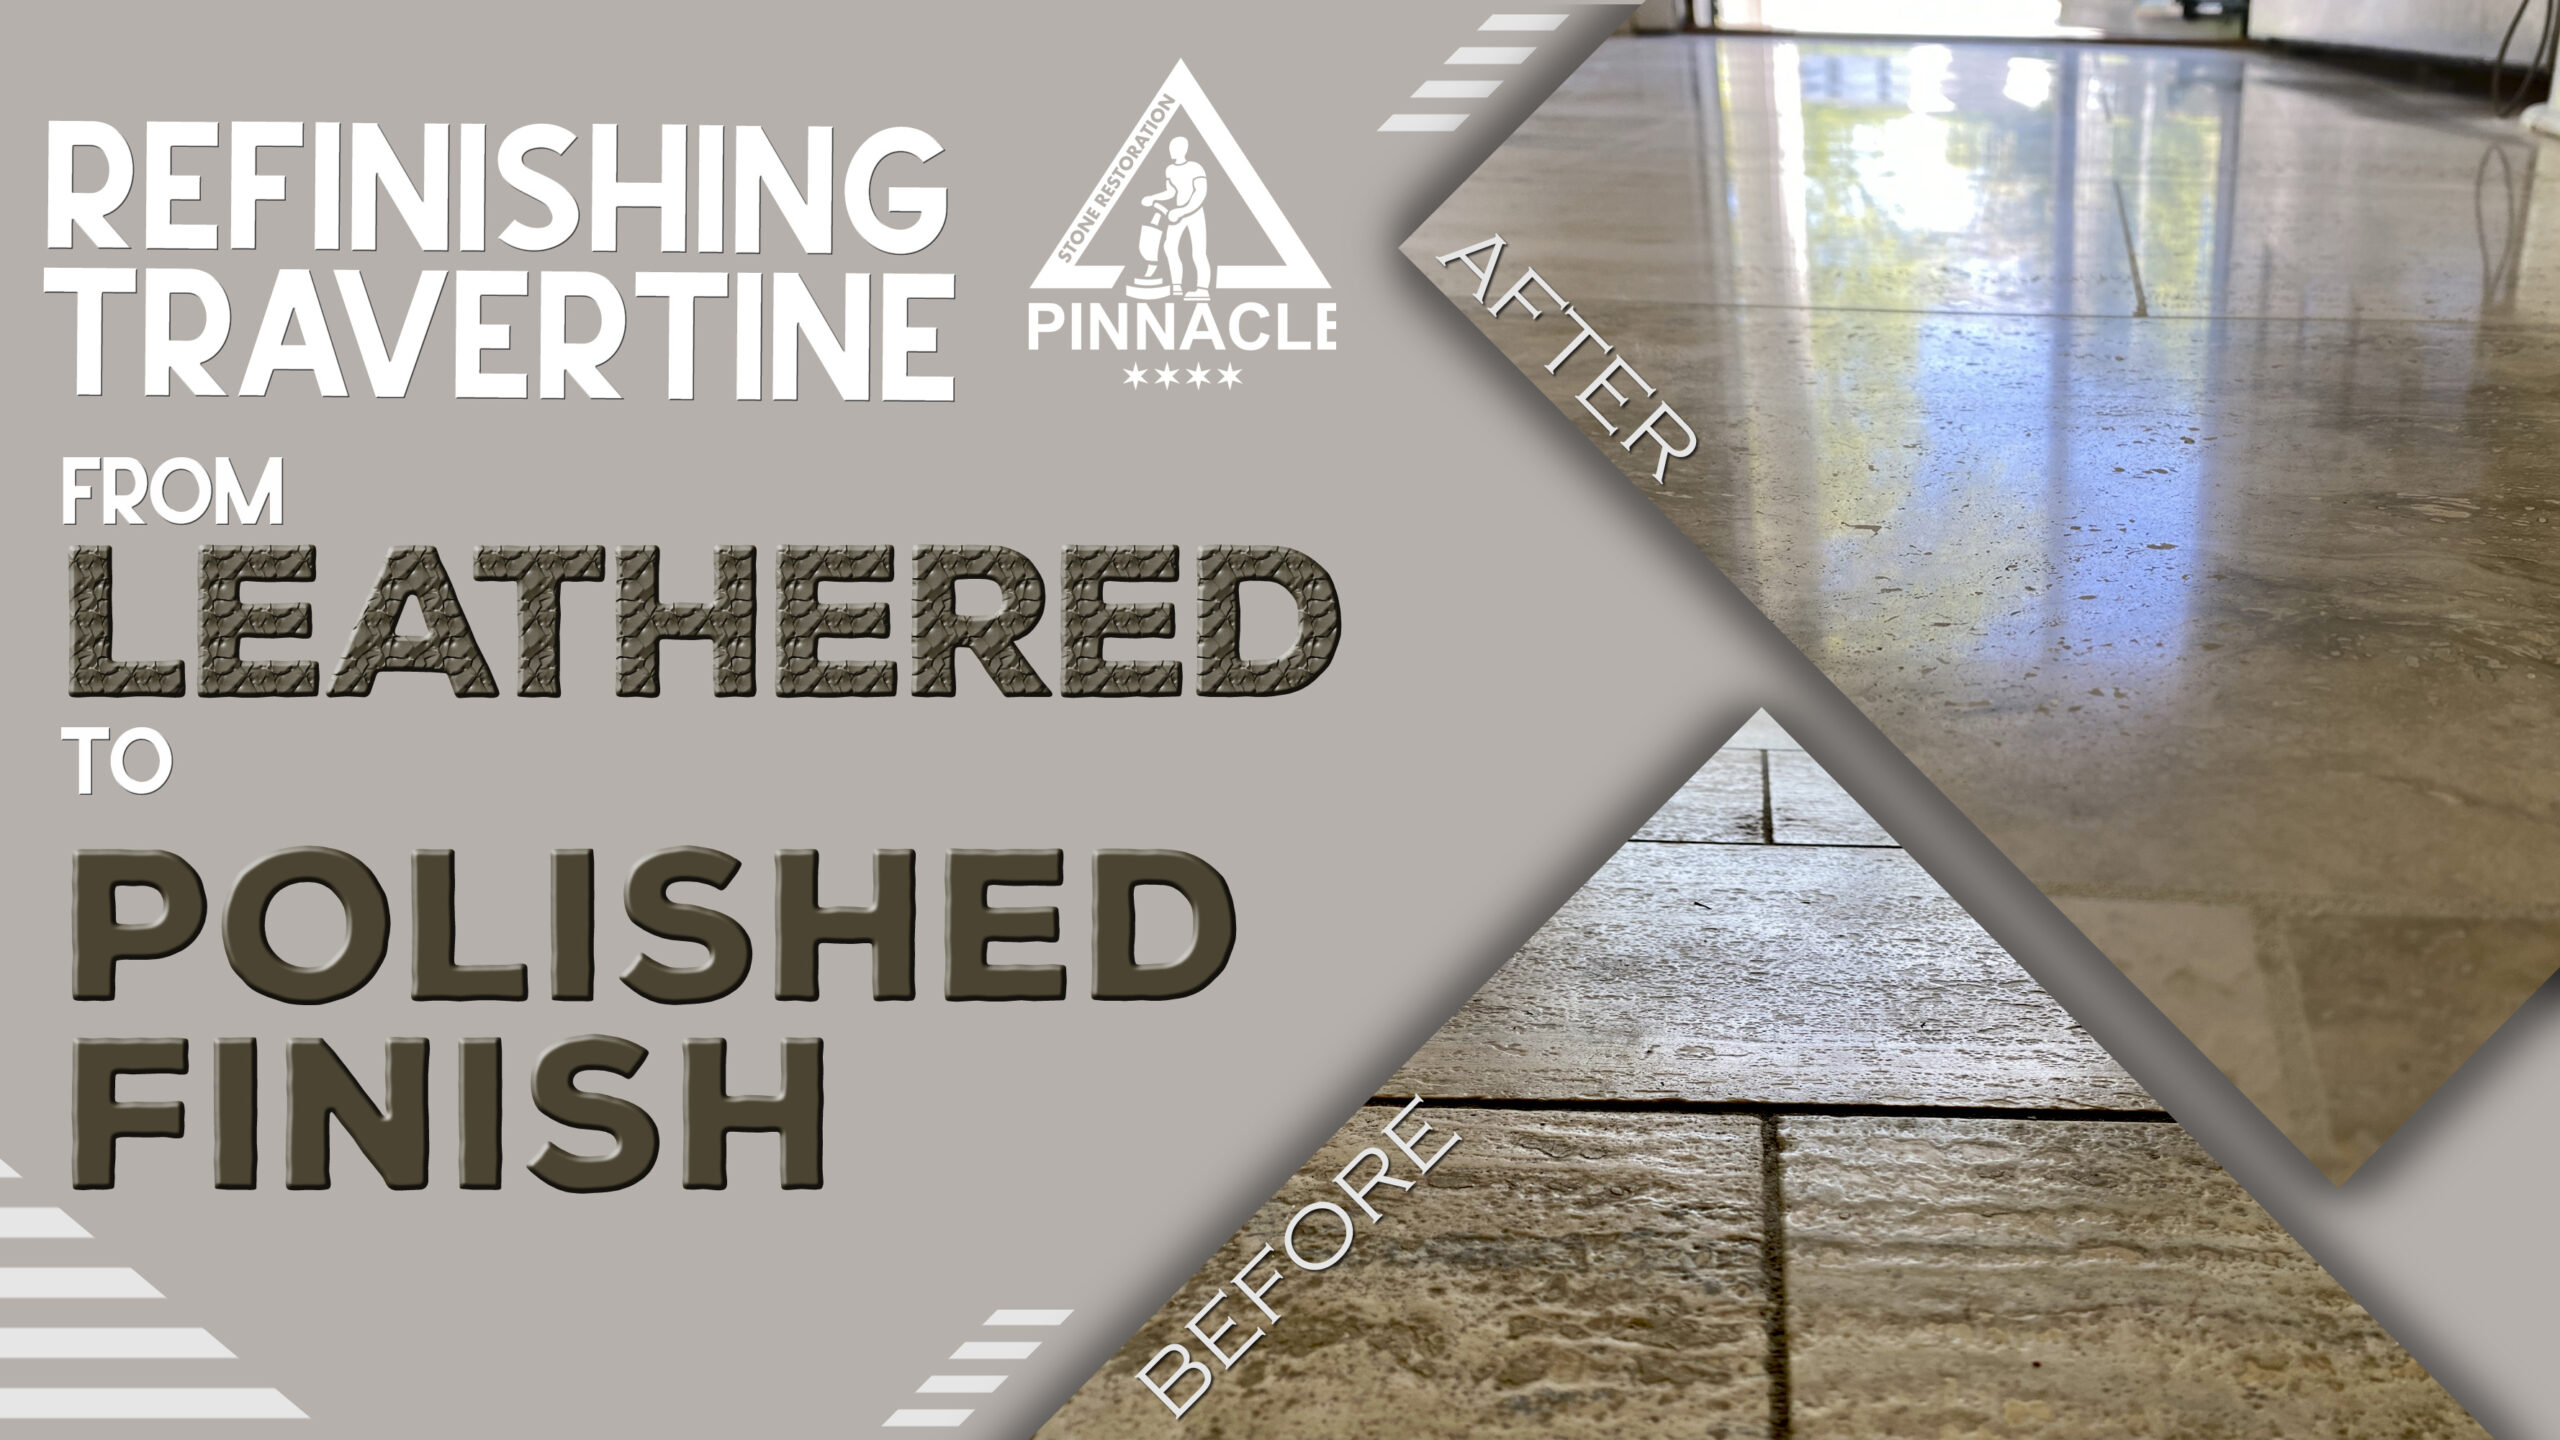 Refinishing travertine from leathered to polished finish. Travertine tile lippage removal, polishing